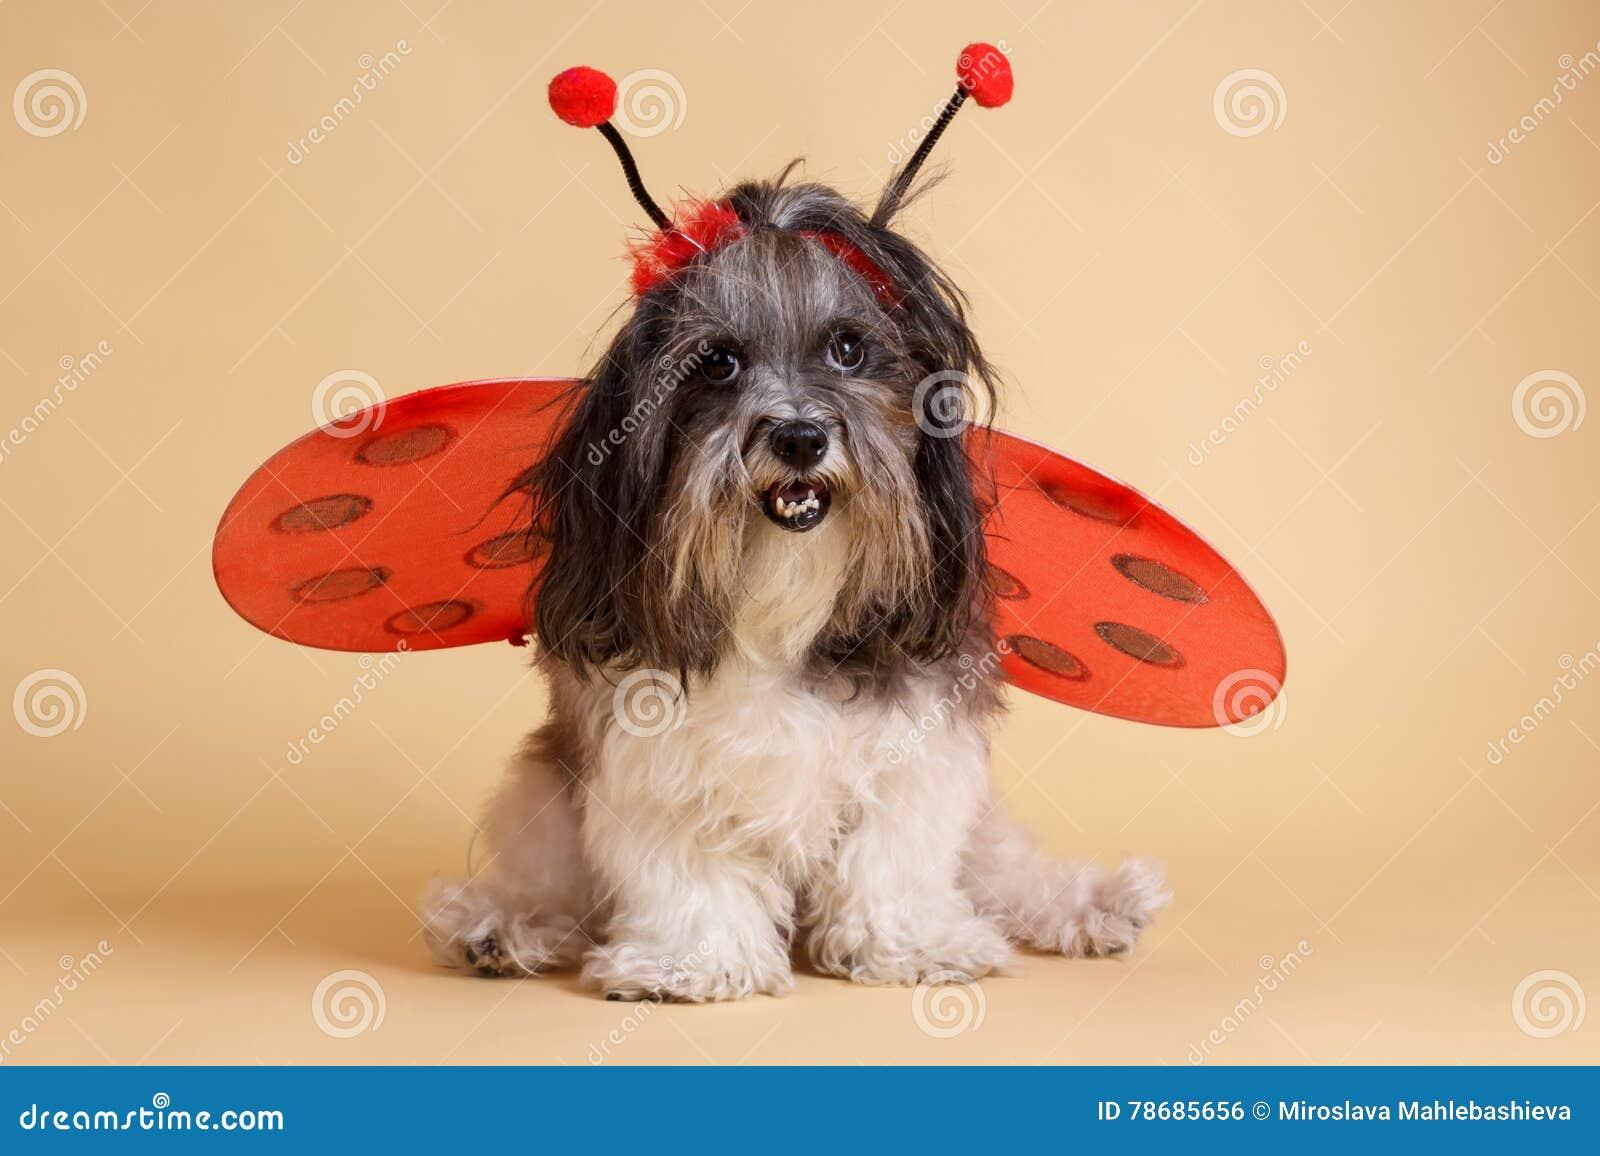 Cute Dog Dressed Up For Halloween Like A Ladybug Stock Photo Image